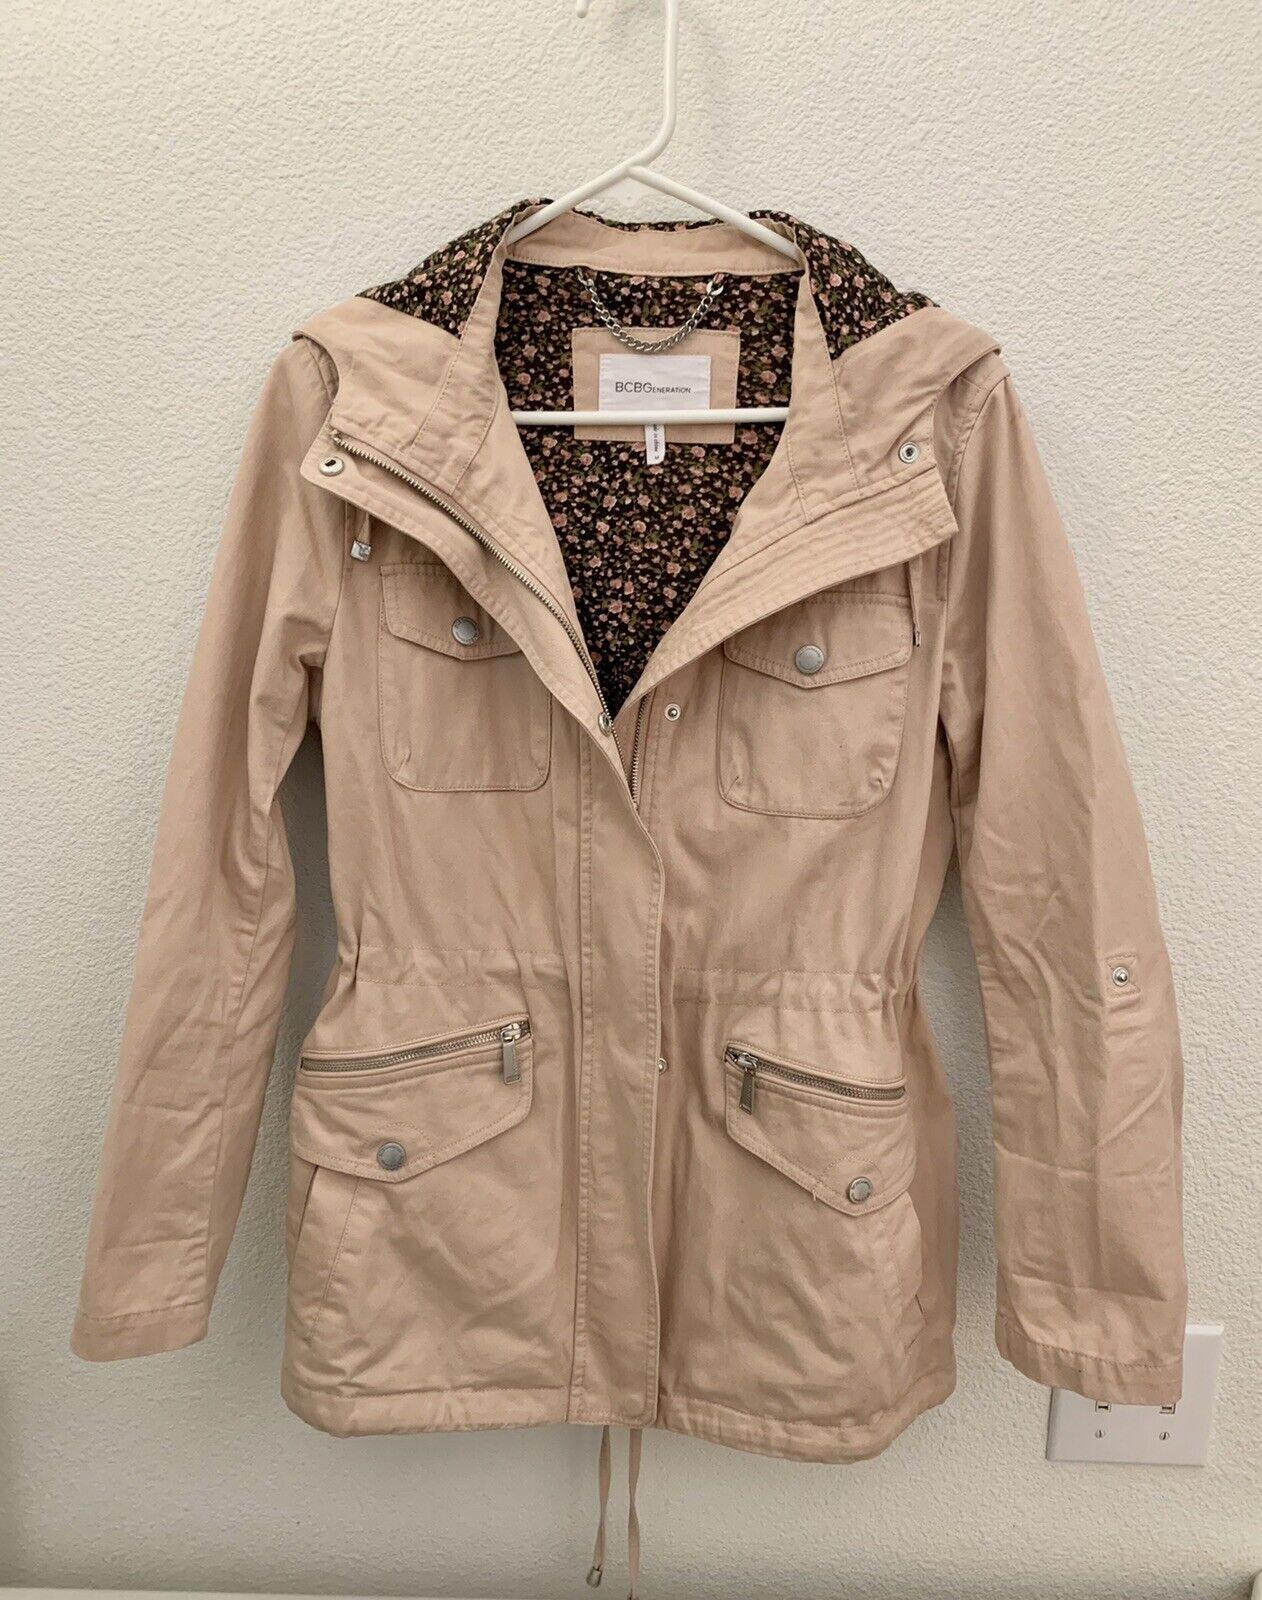 BCBGeneration Womens Medium M Blush Pink Brown Floral Utility Anorak Jacket Coat